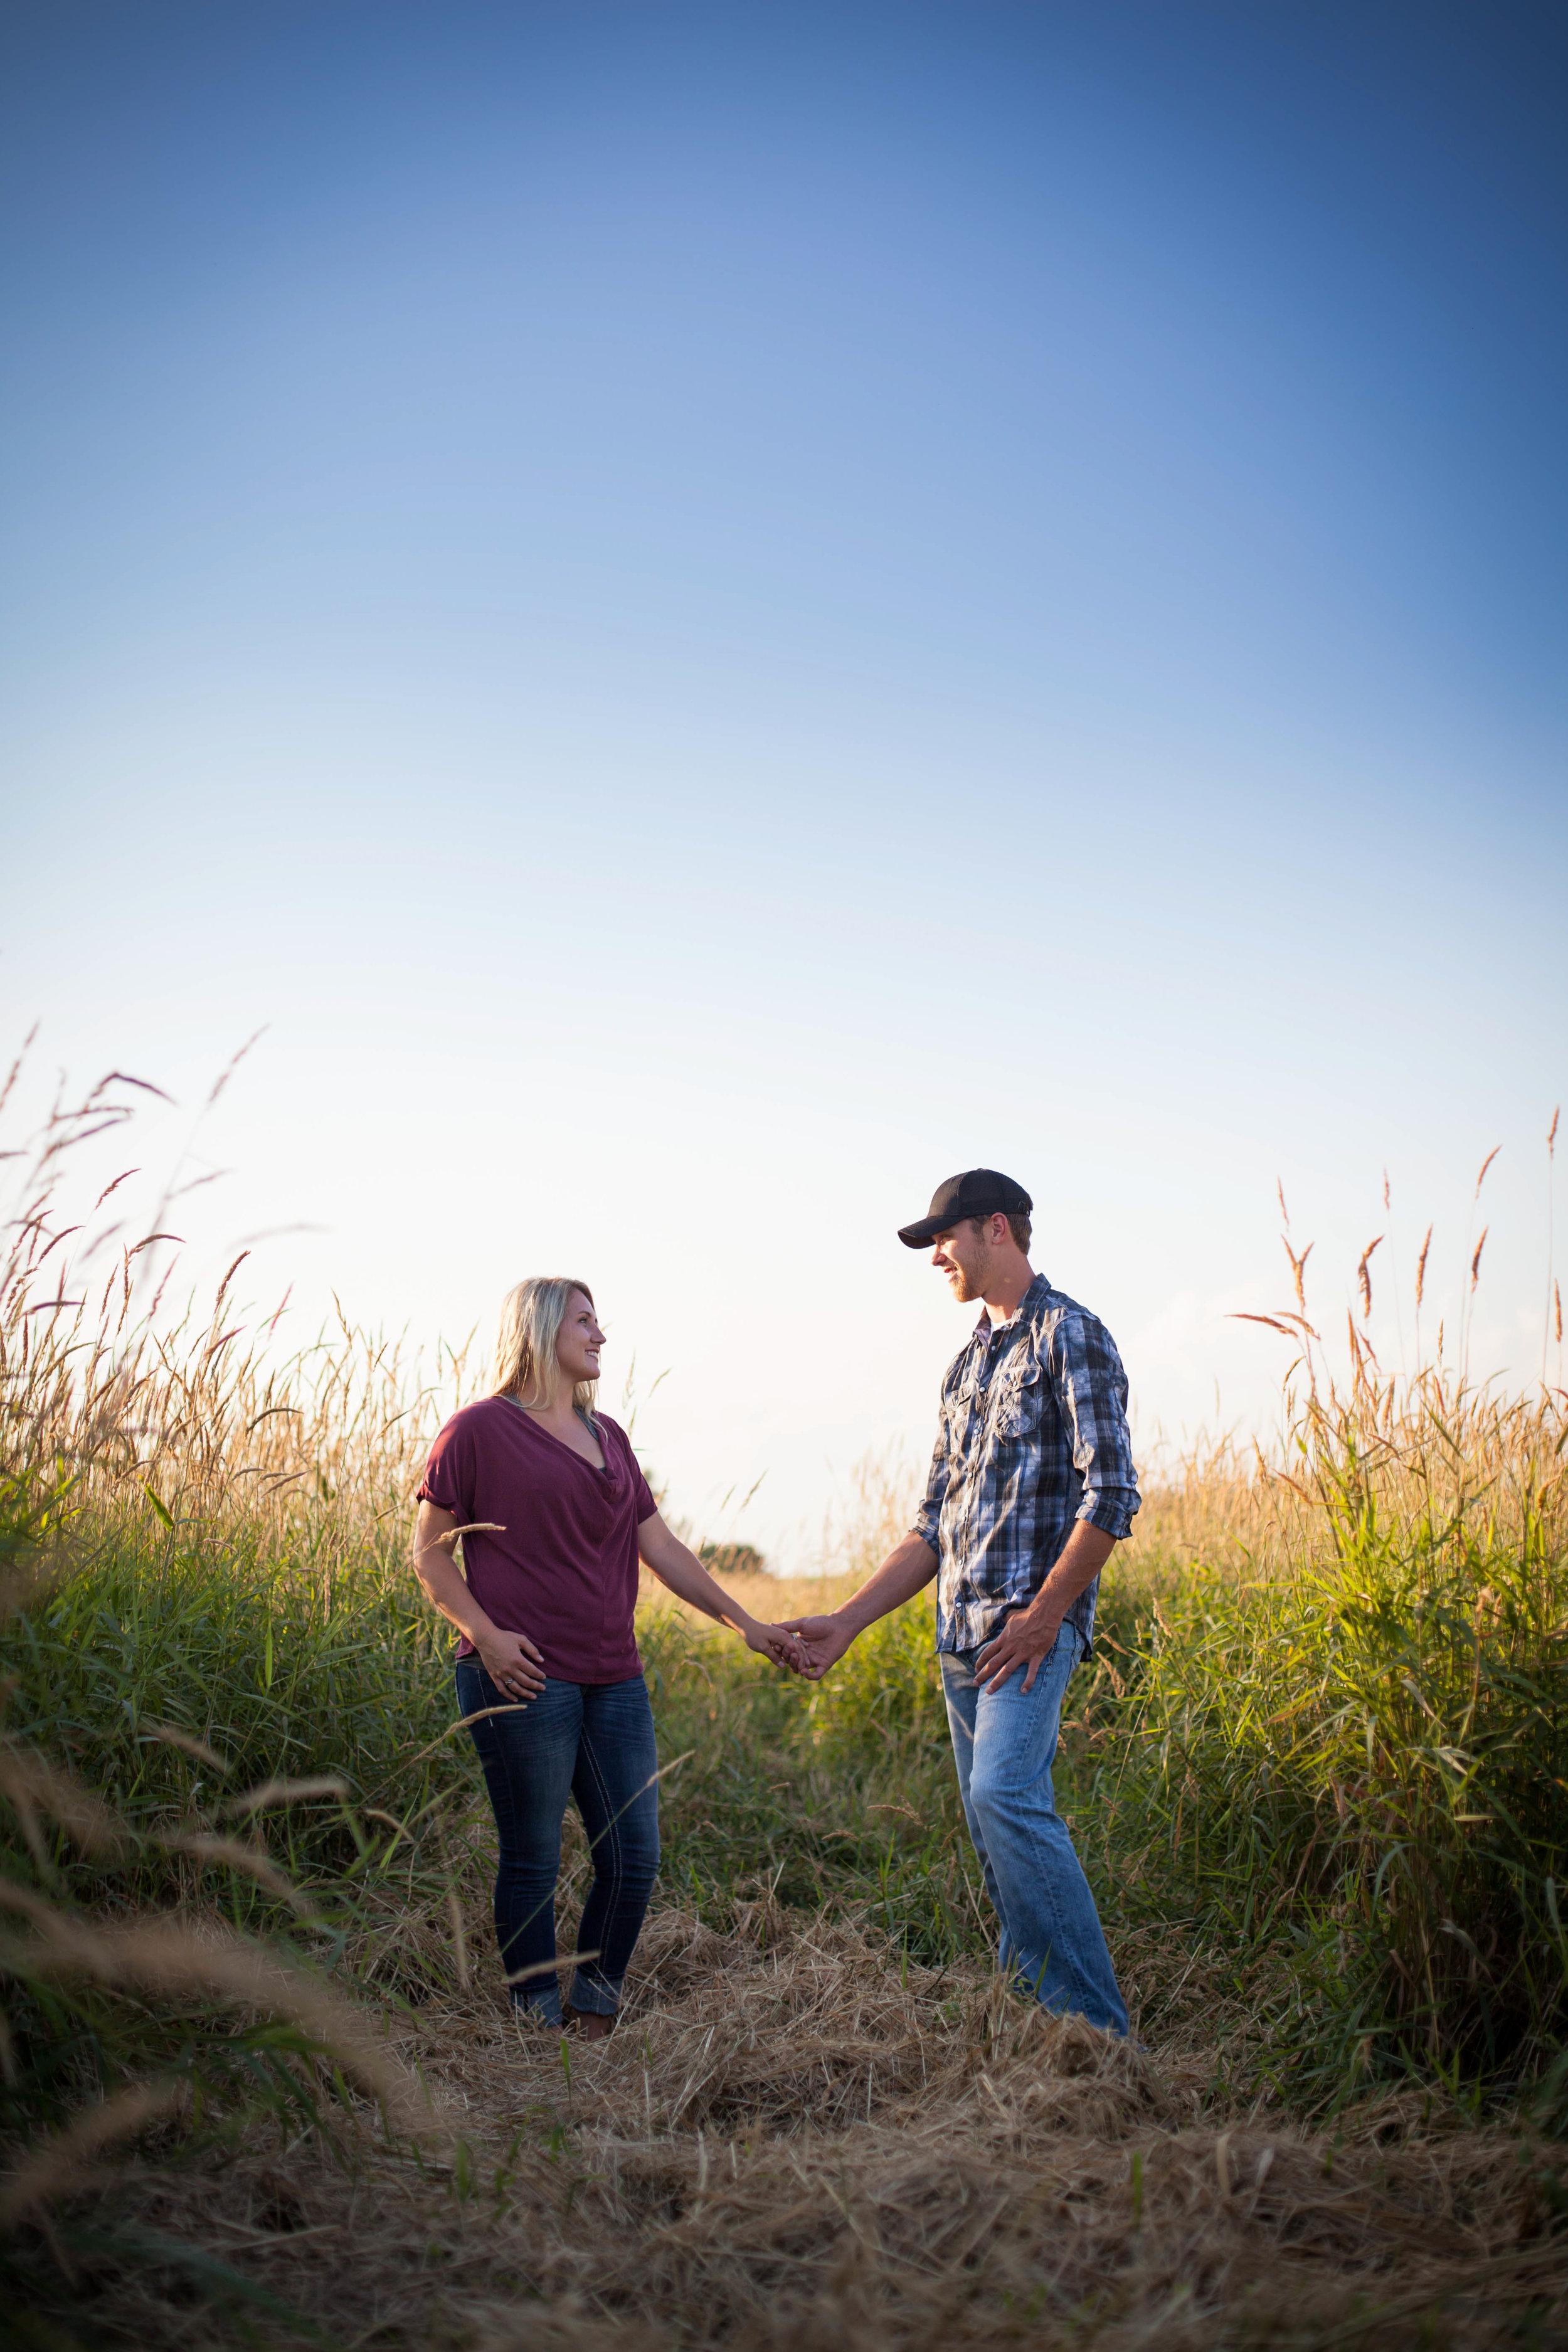 minnesota proposal engagement © kelilina photography 20170715144255.jpg